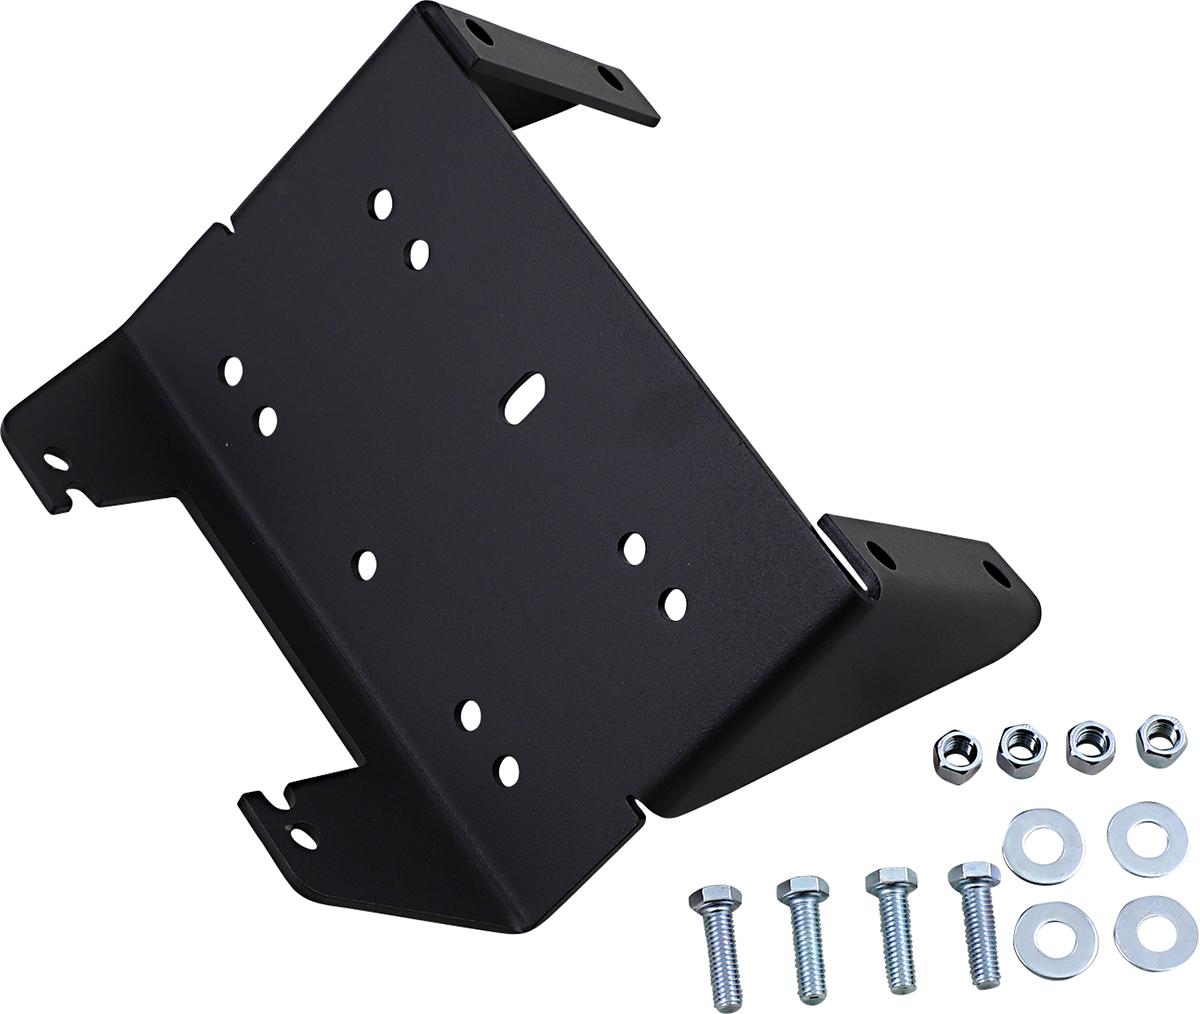 Moose Utility Black UTV Winch Mounting Plate 15-20 Kawasaki Mule Pro FX FXR DX